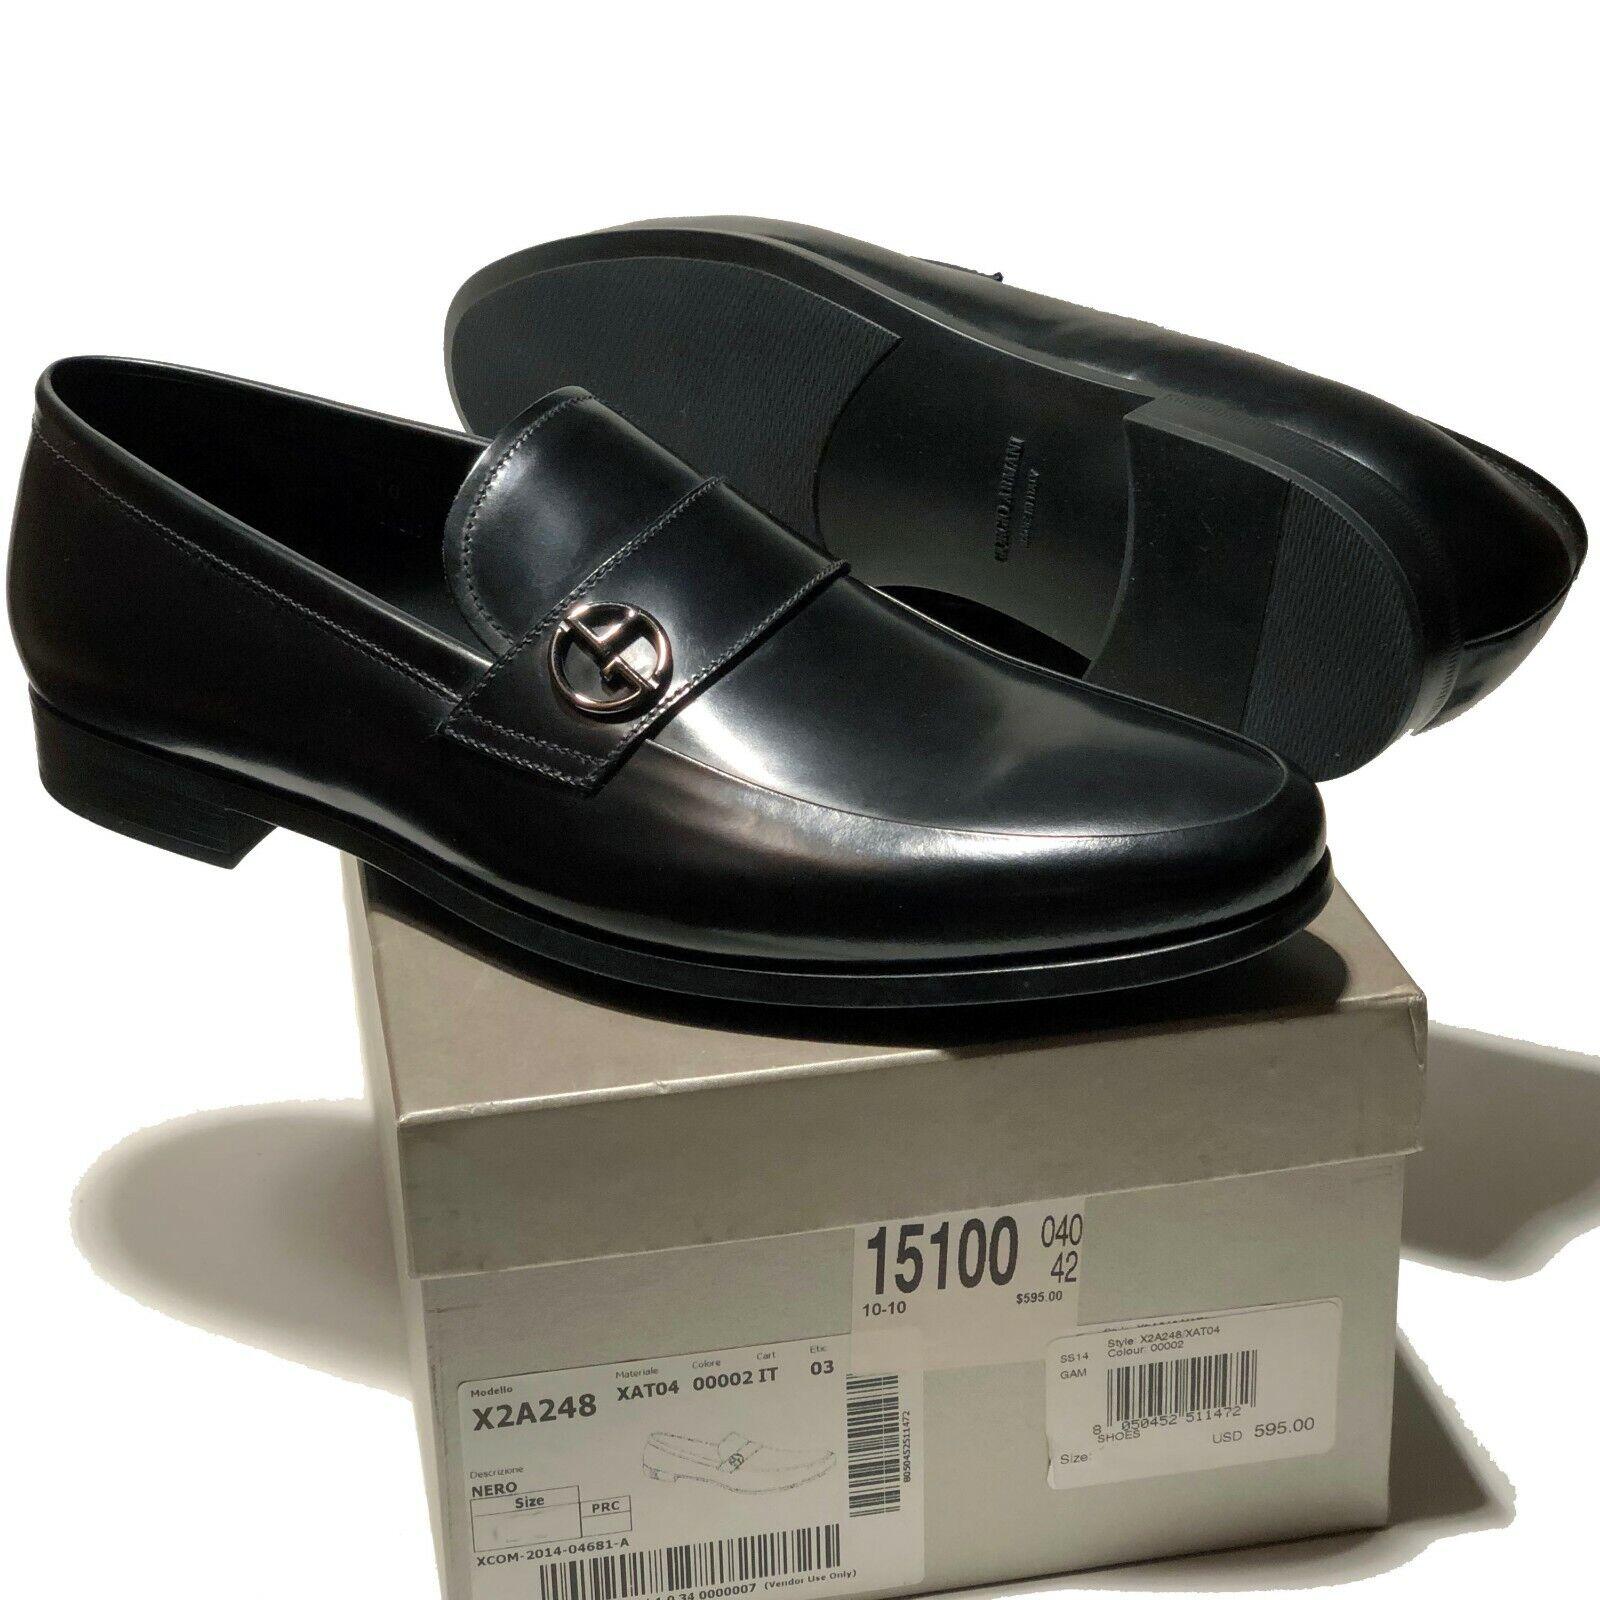 ARMANI nero Leather Fashion Loafers Men's 9 Formal Moccasin Dress Casual Tuxedo